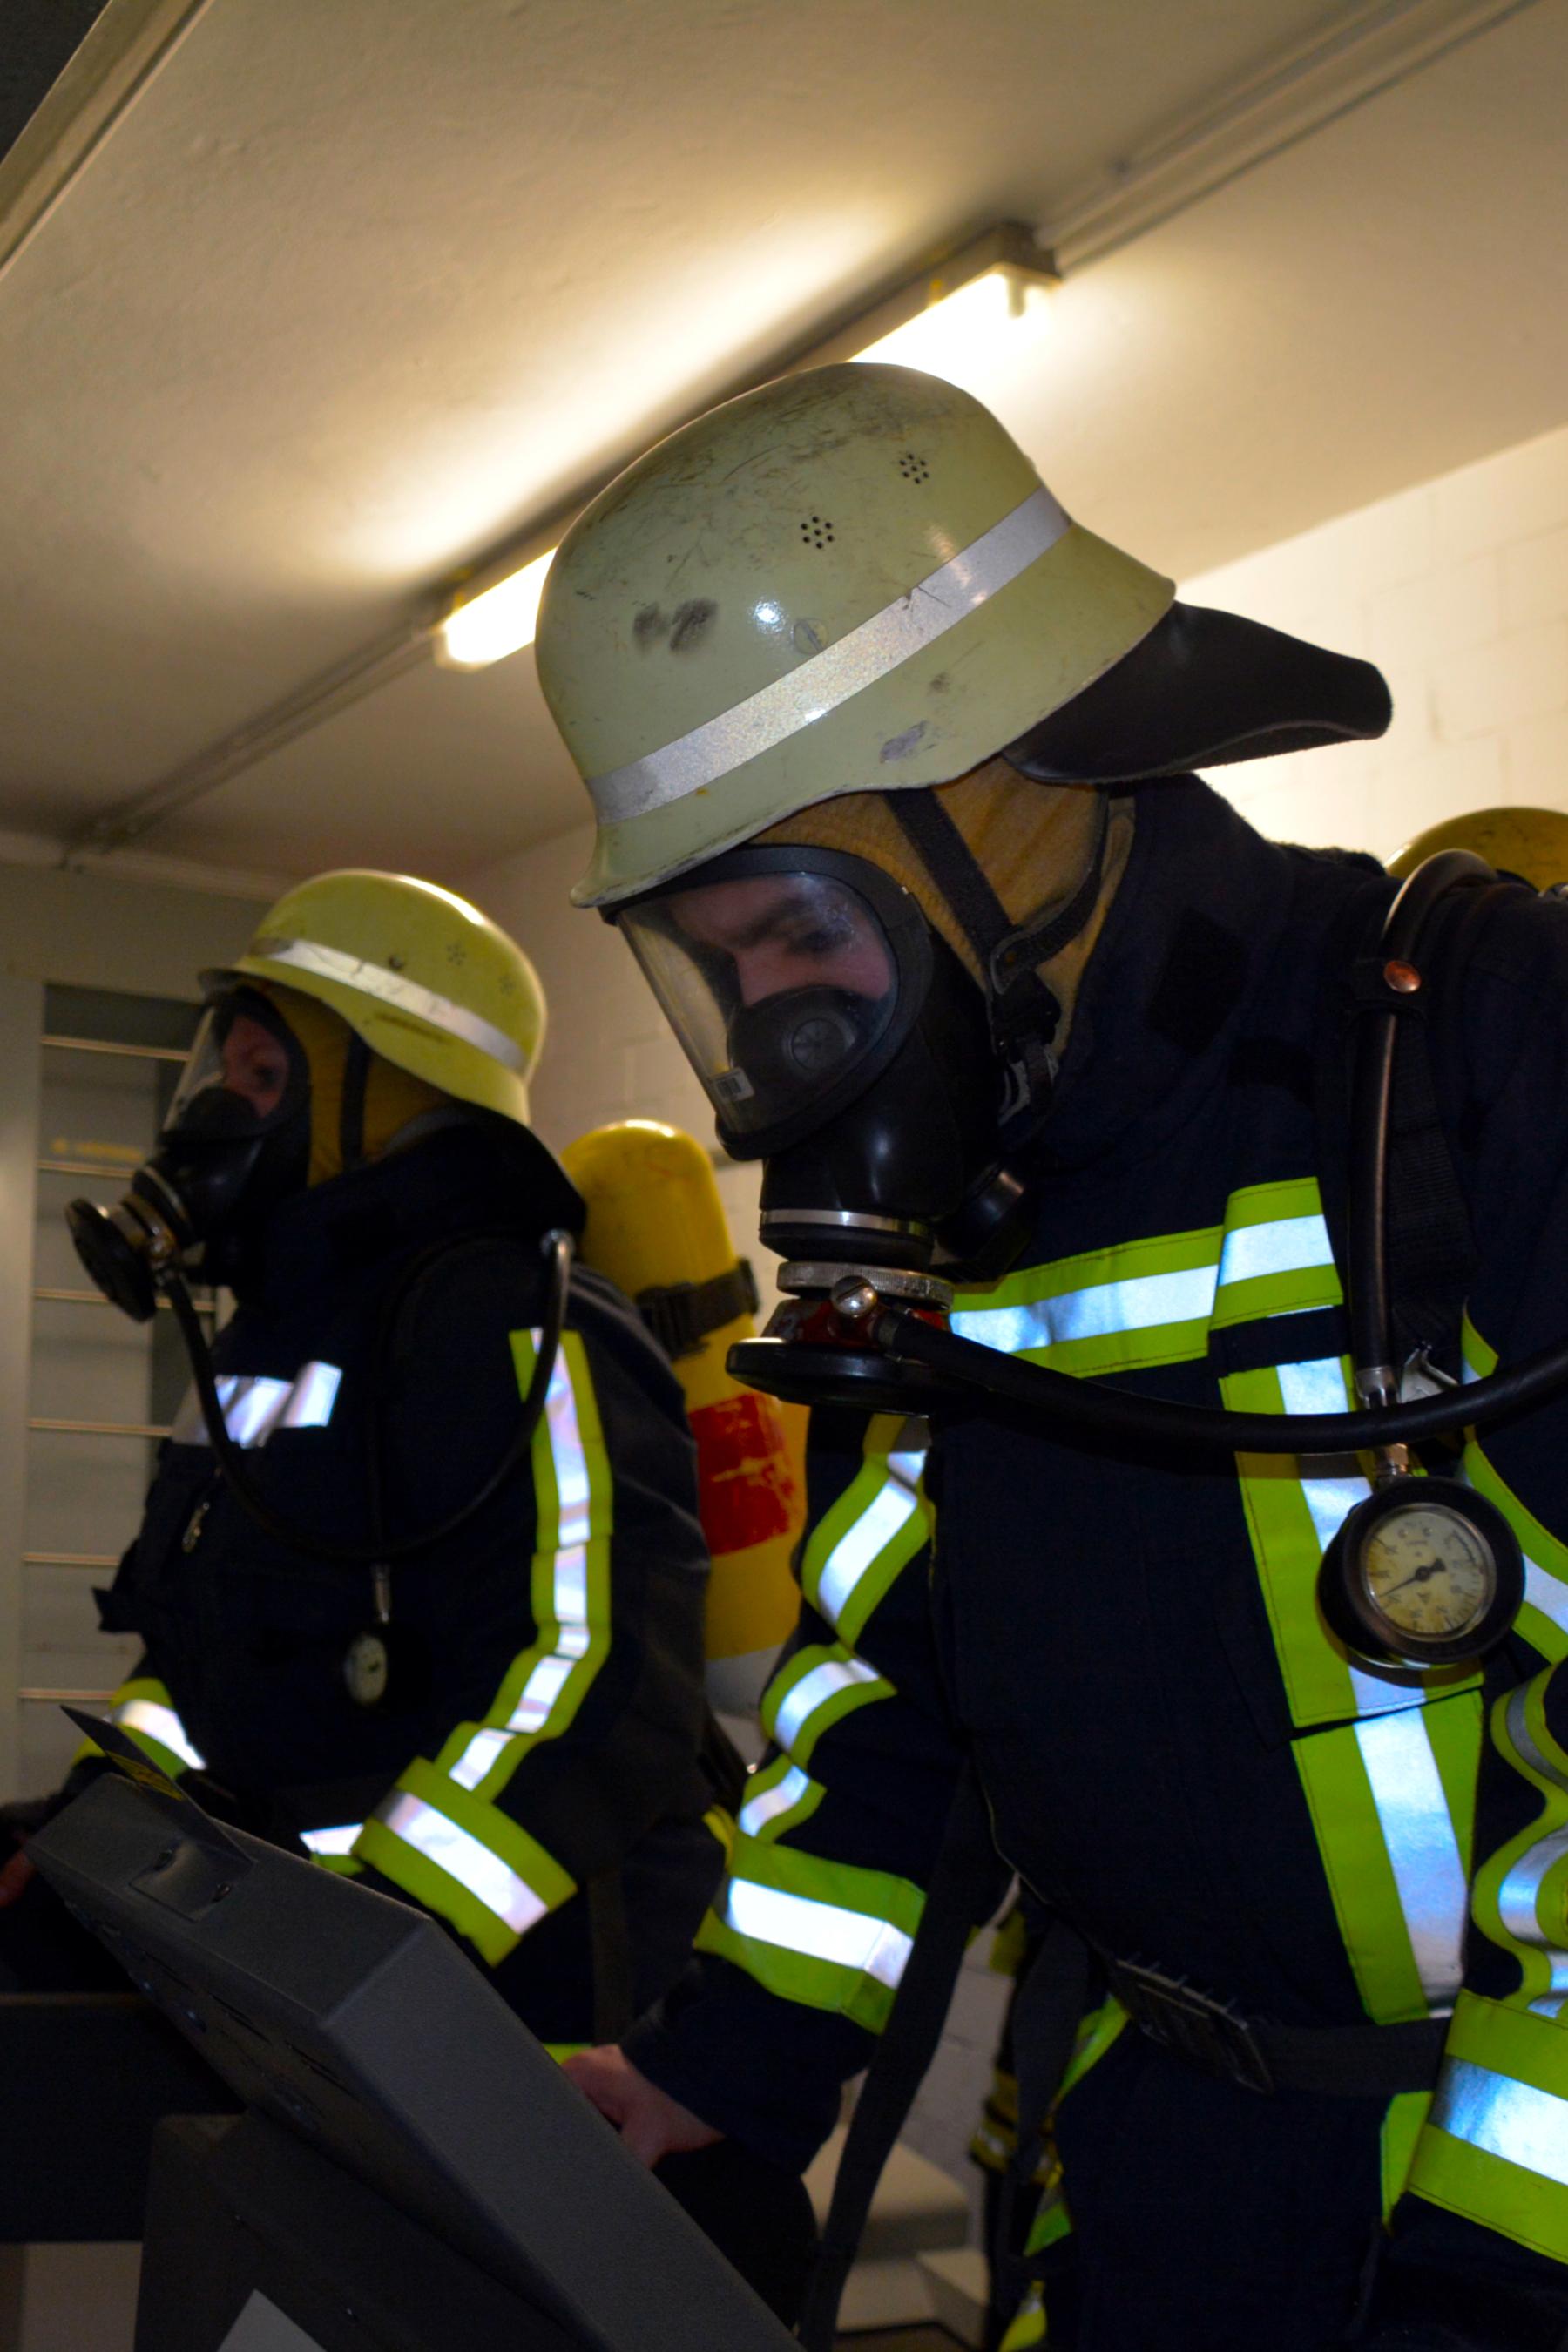 images/com_firefighters/images/ausbildungen/Atemschutz.jpg